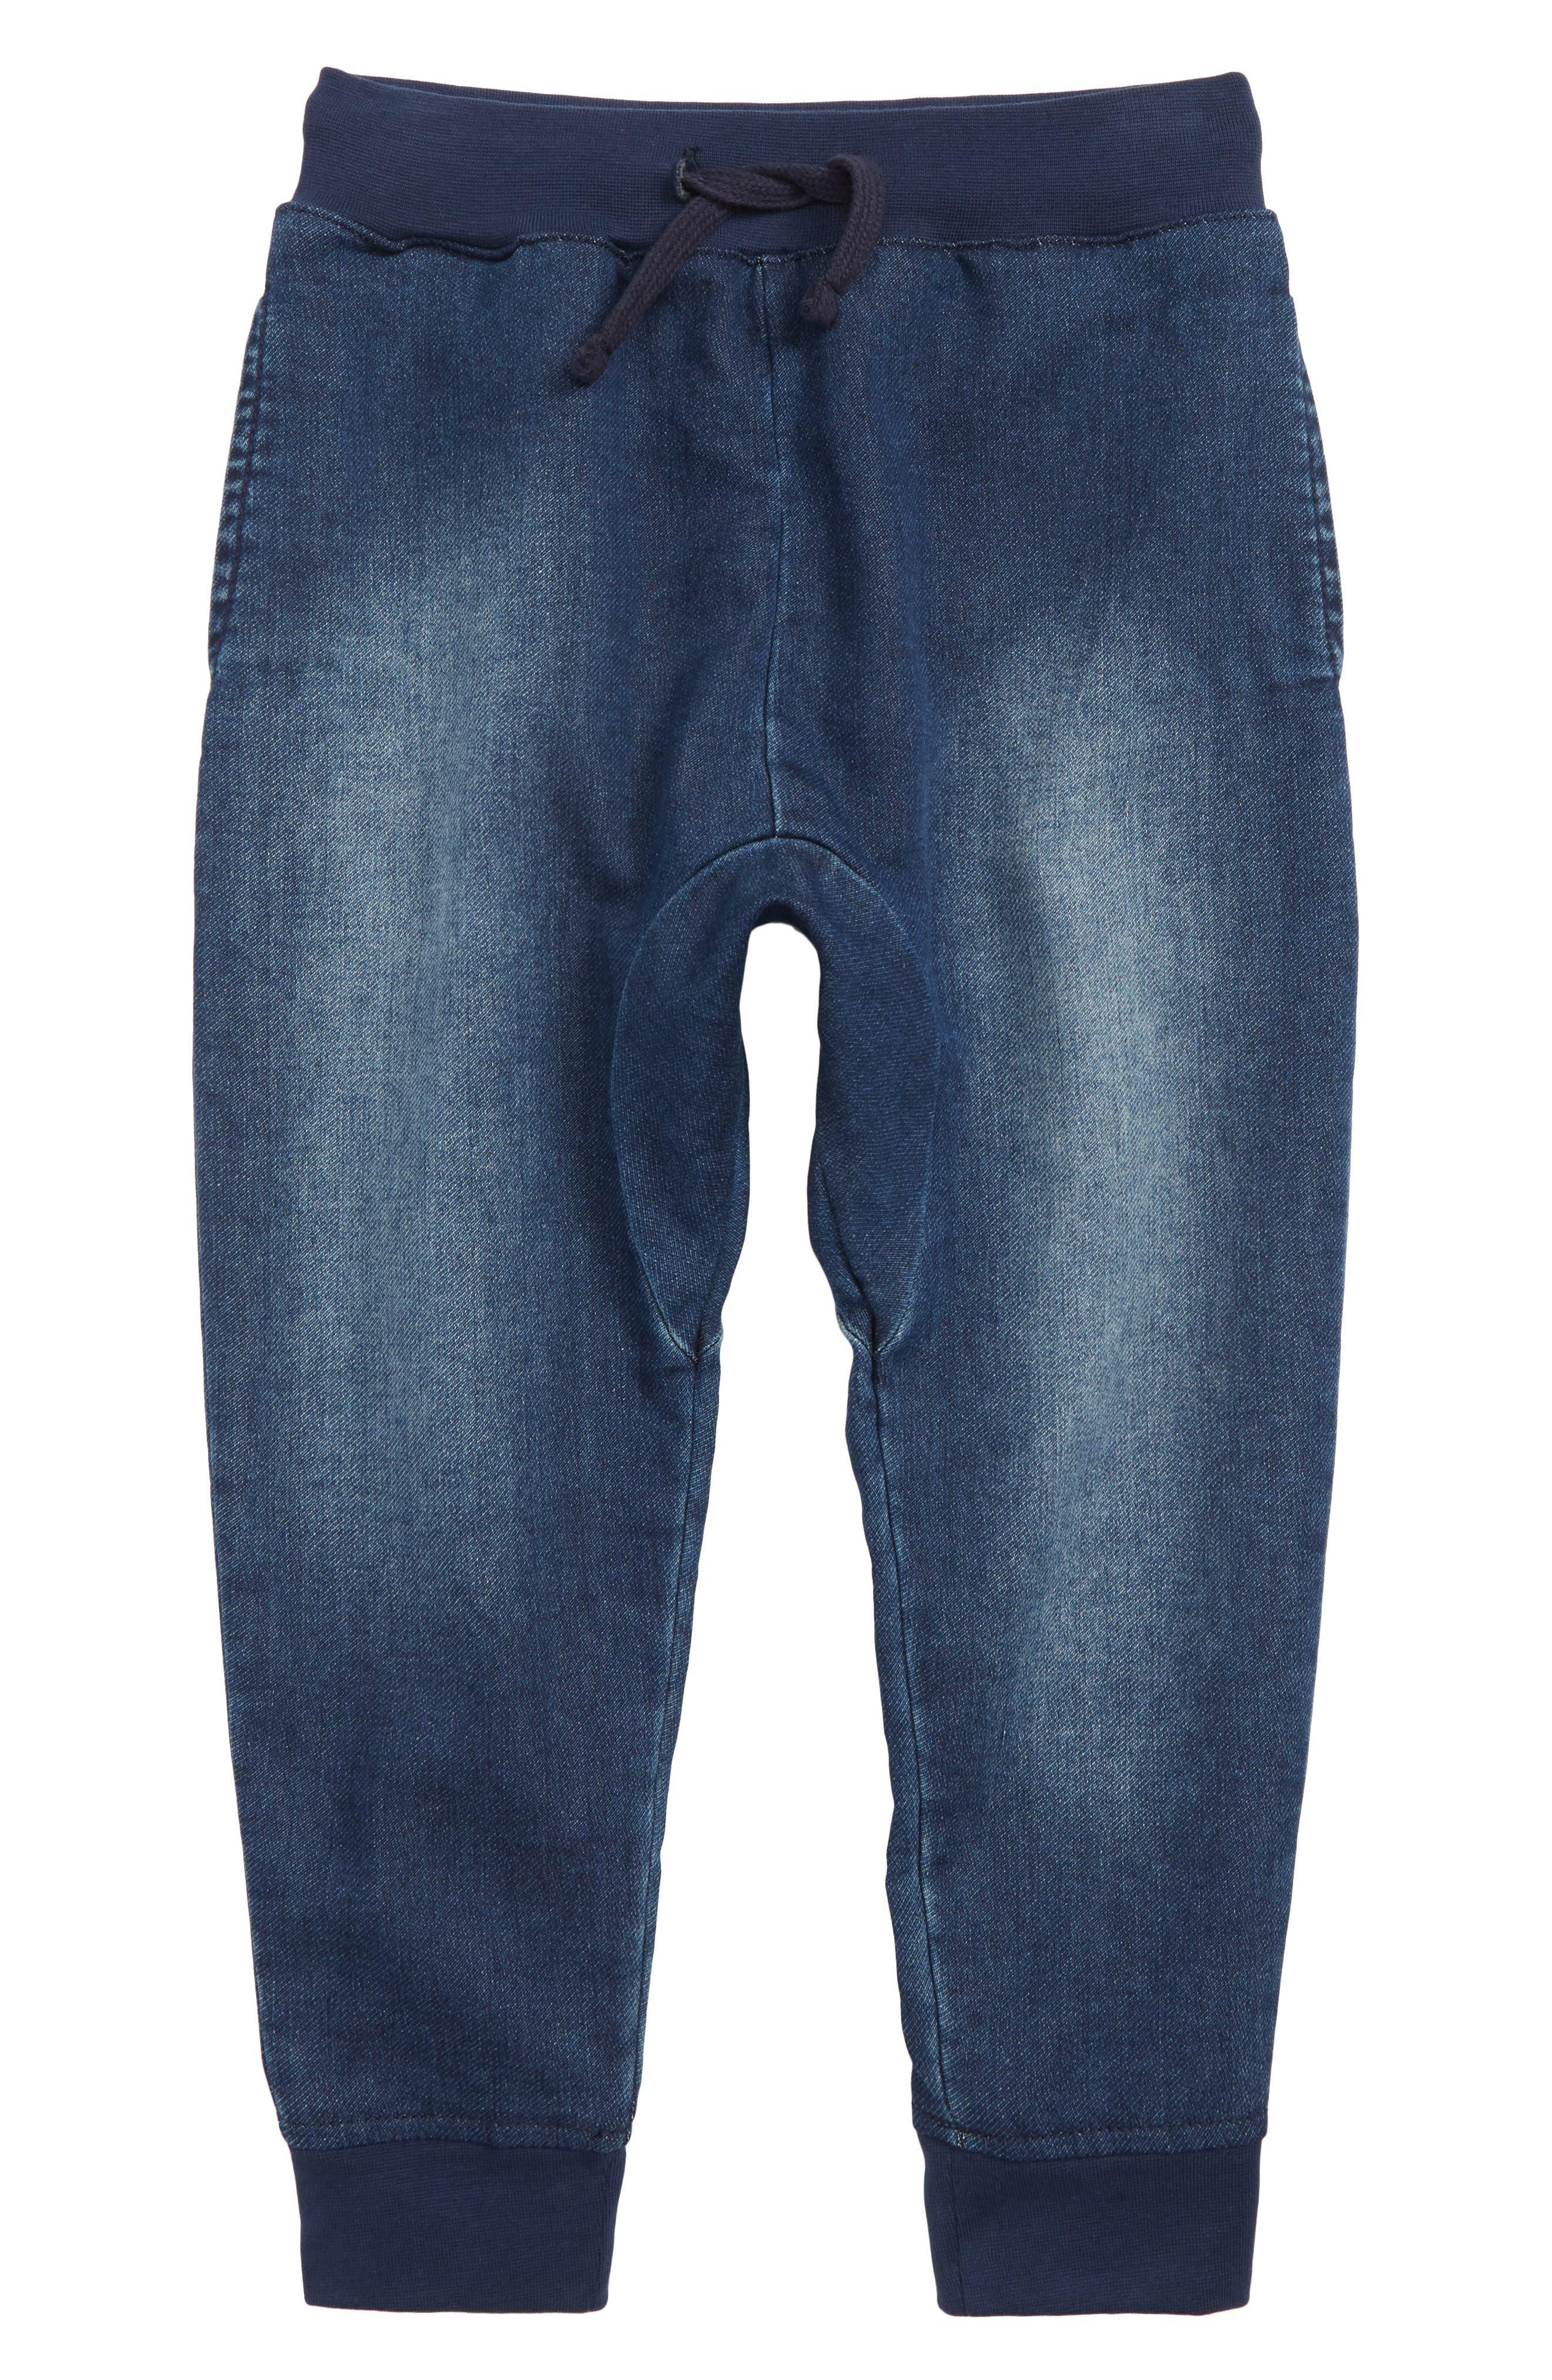 Denim Jogger Pants,                         Main,                         color, 420